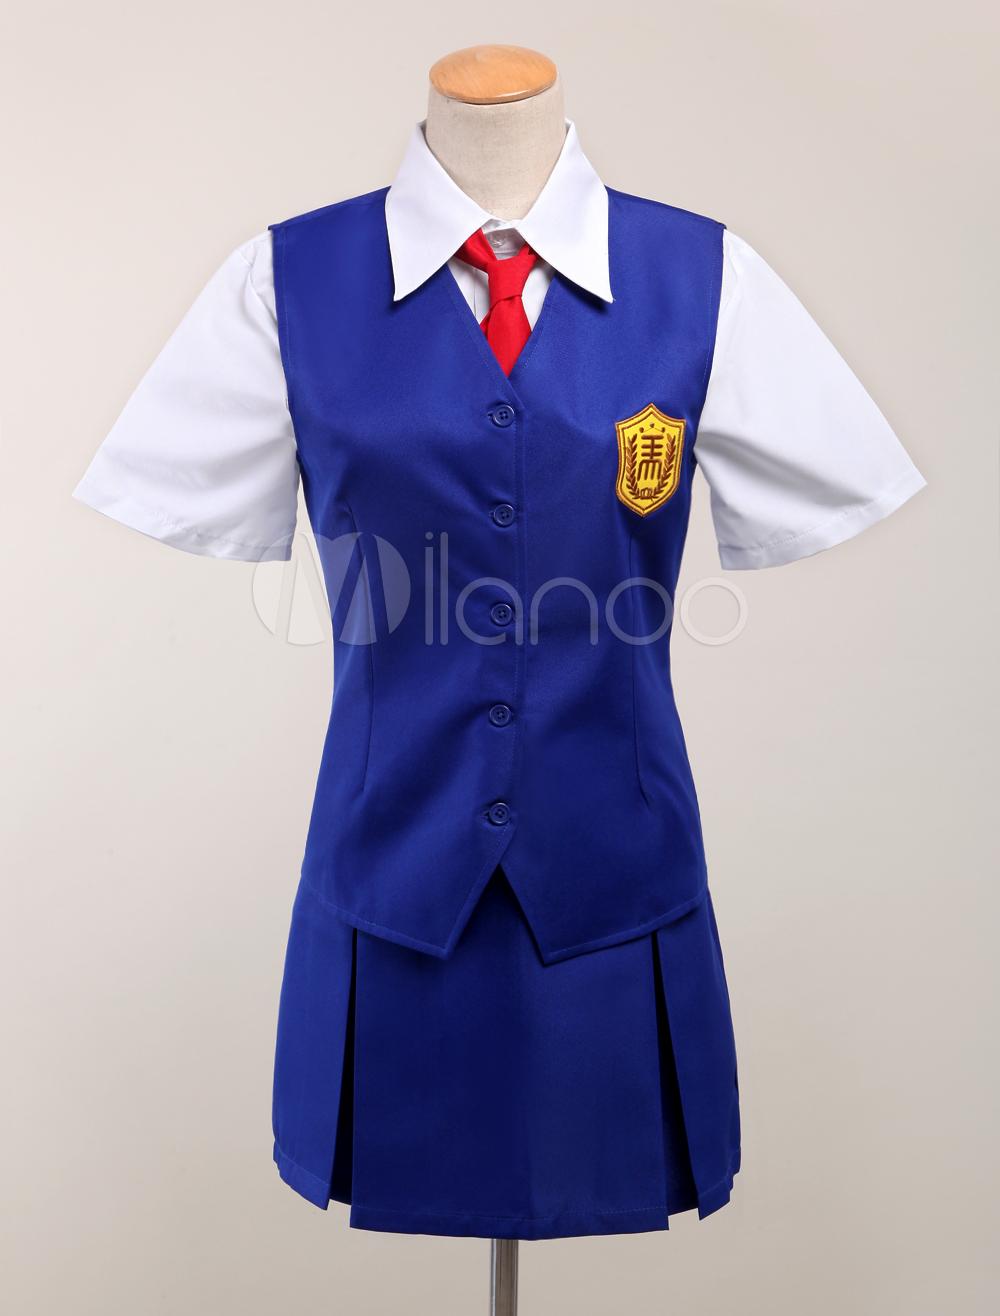 Buy Anohana Tsurumi Chiriko Halloween Cosplay Costume School Uniform Halloween for $68.99 in Milanoo store